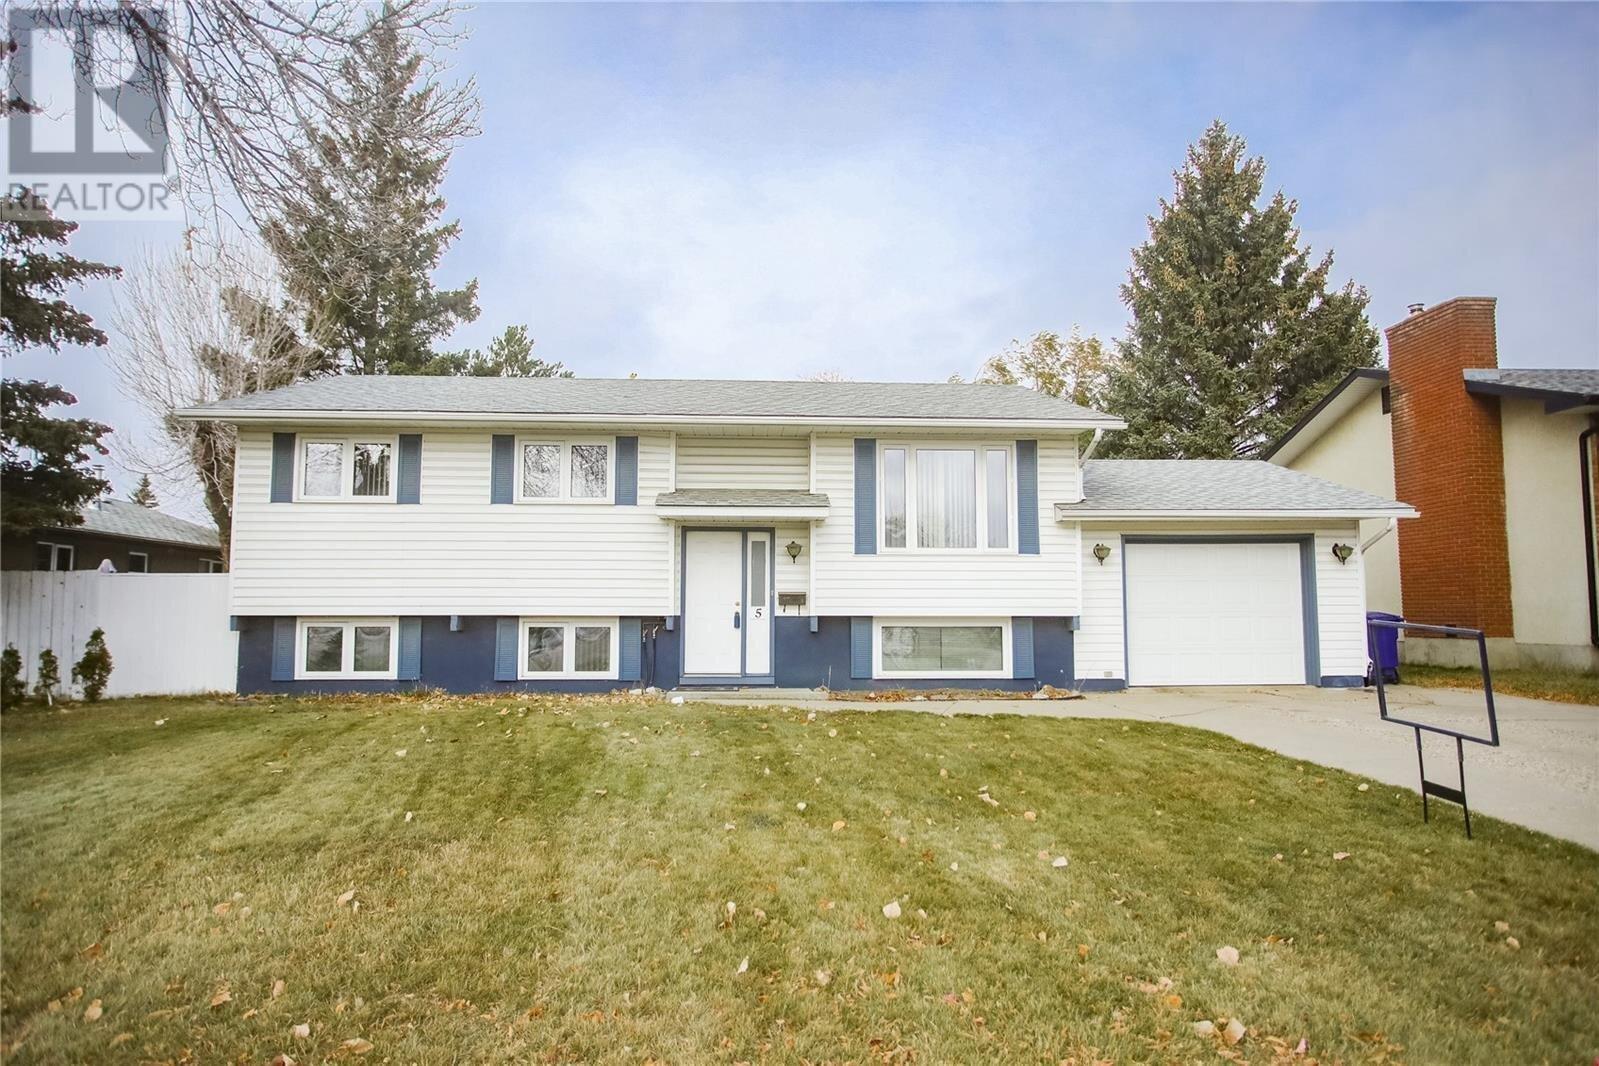 House for sale at 5 Duncan Cres Saskatoon Saskatchewan - MLS: SK831207